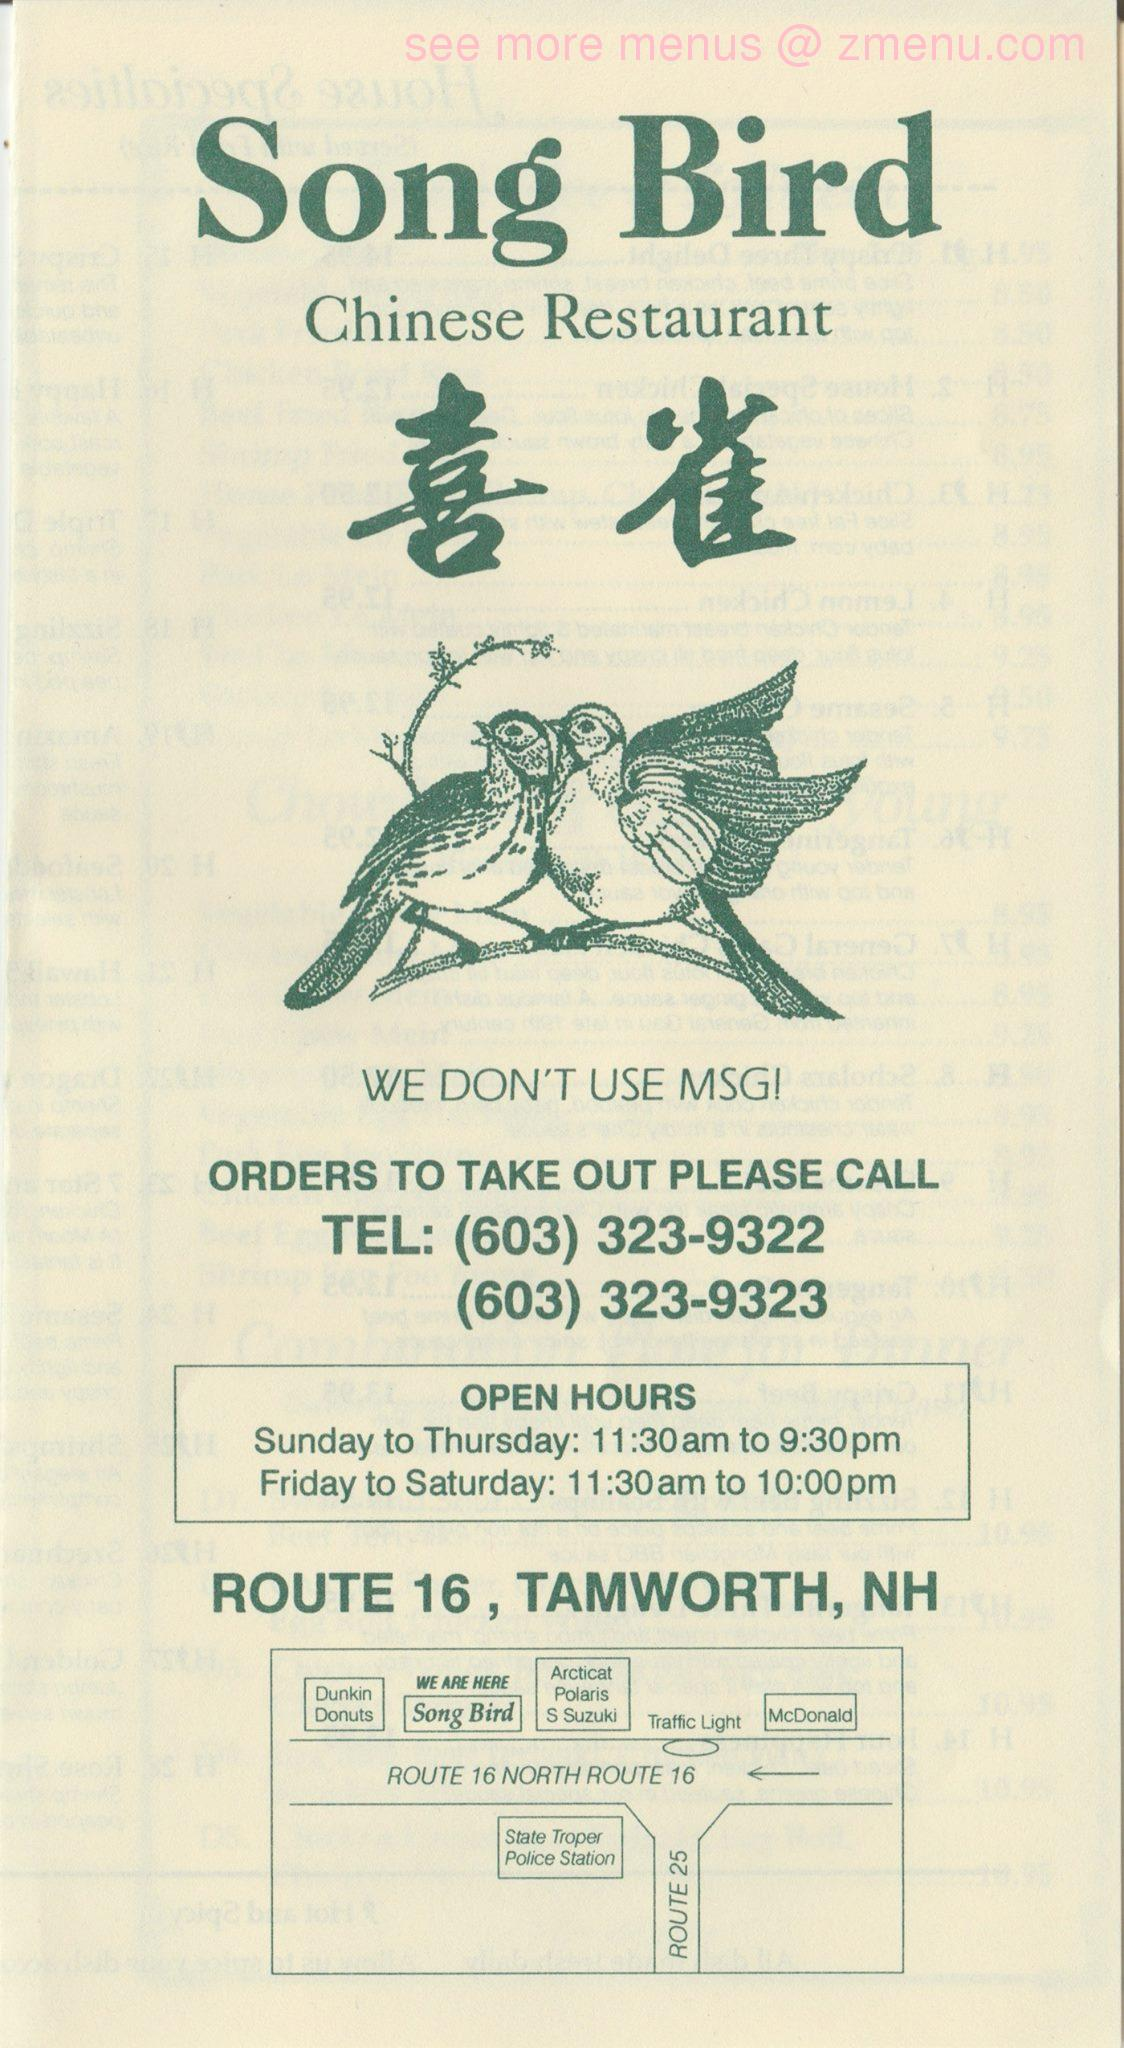 Songbird Chinese Restaurant